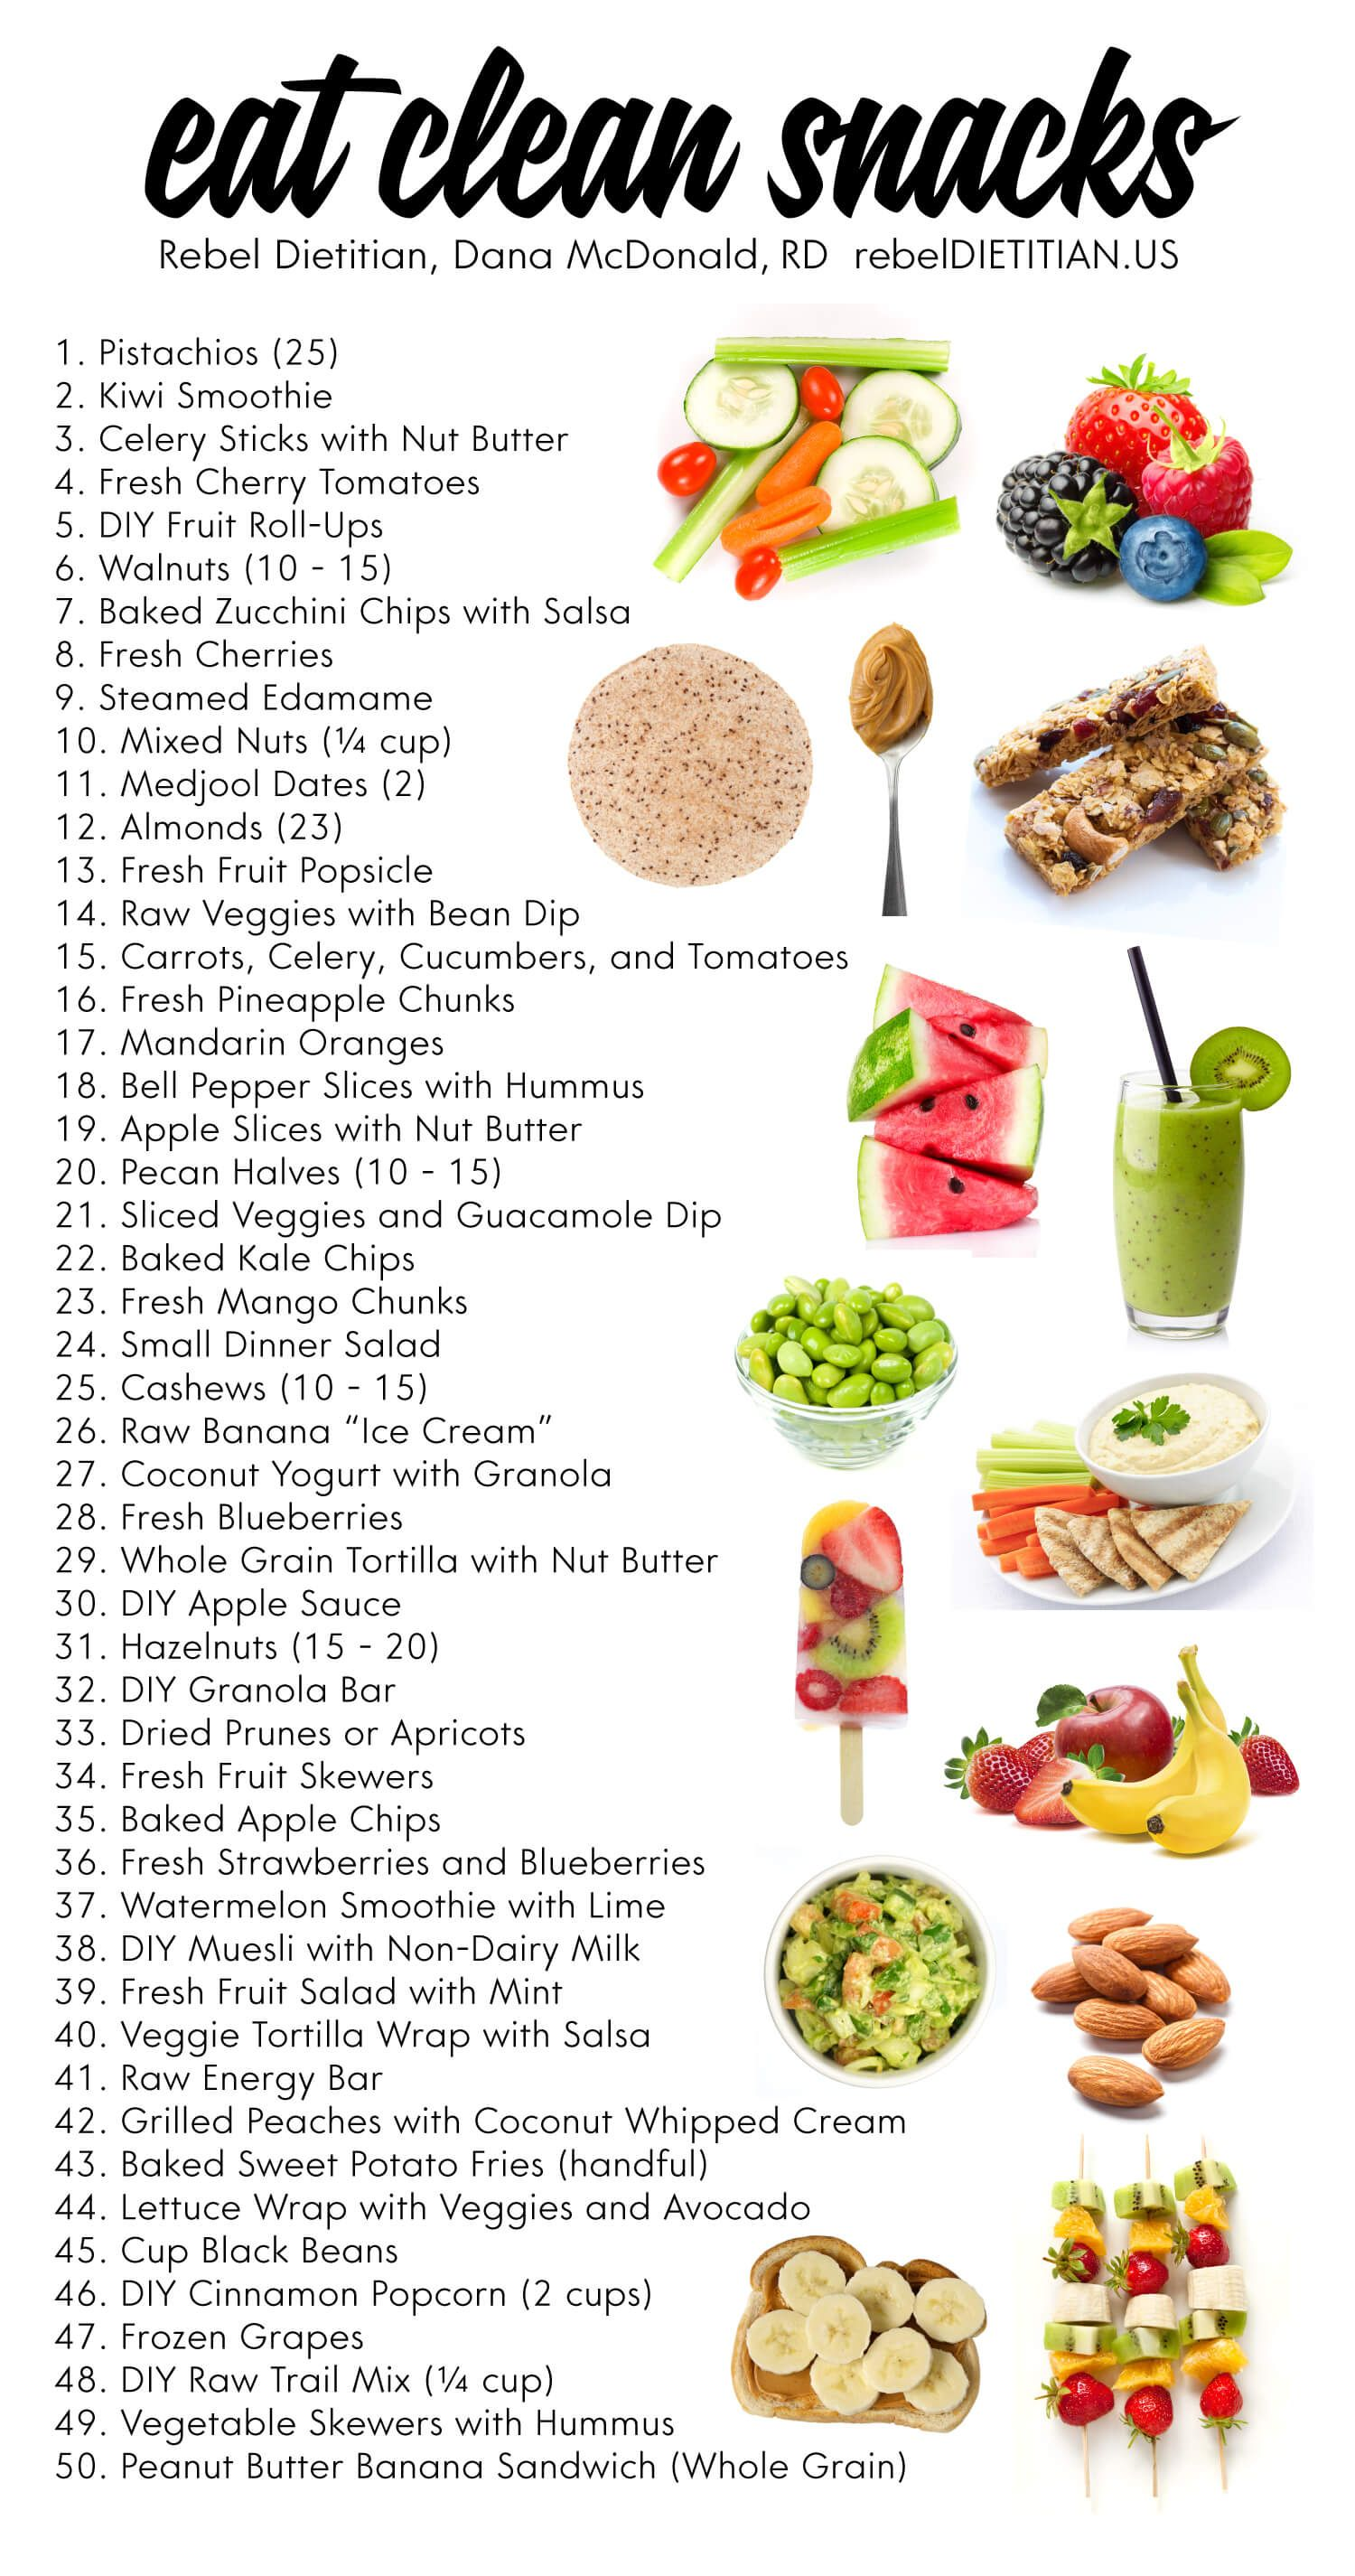 Updated Healthy Snack Ideas (Vegan) rebelDIETITIAN.US